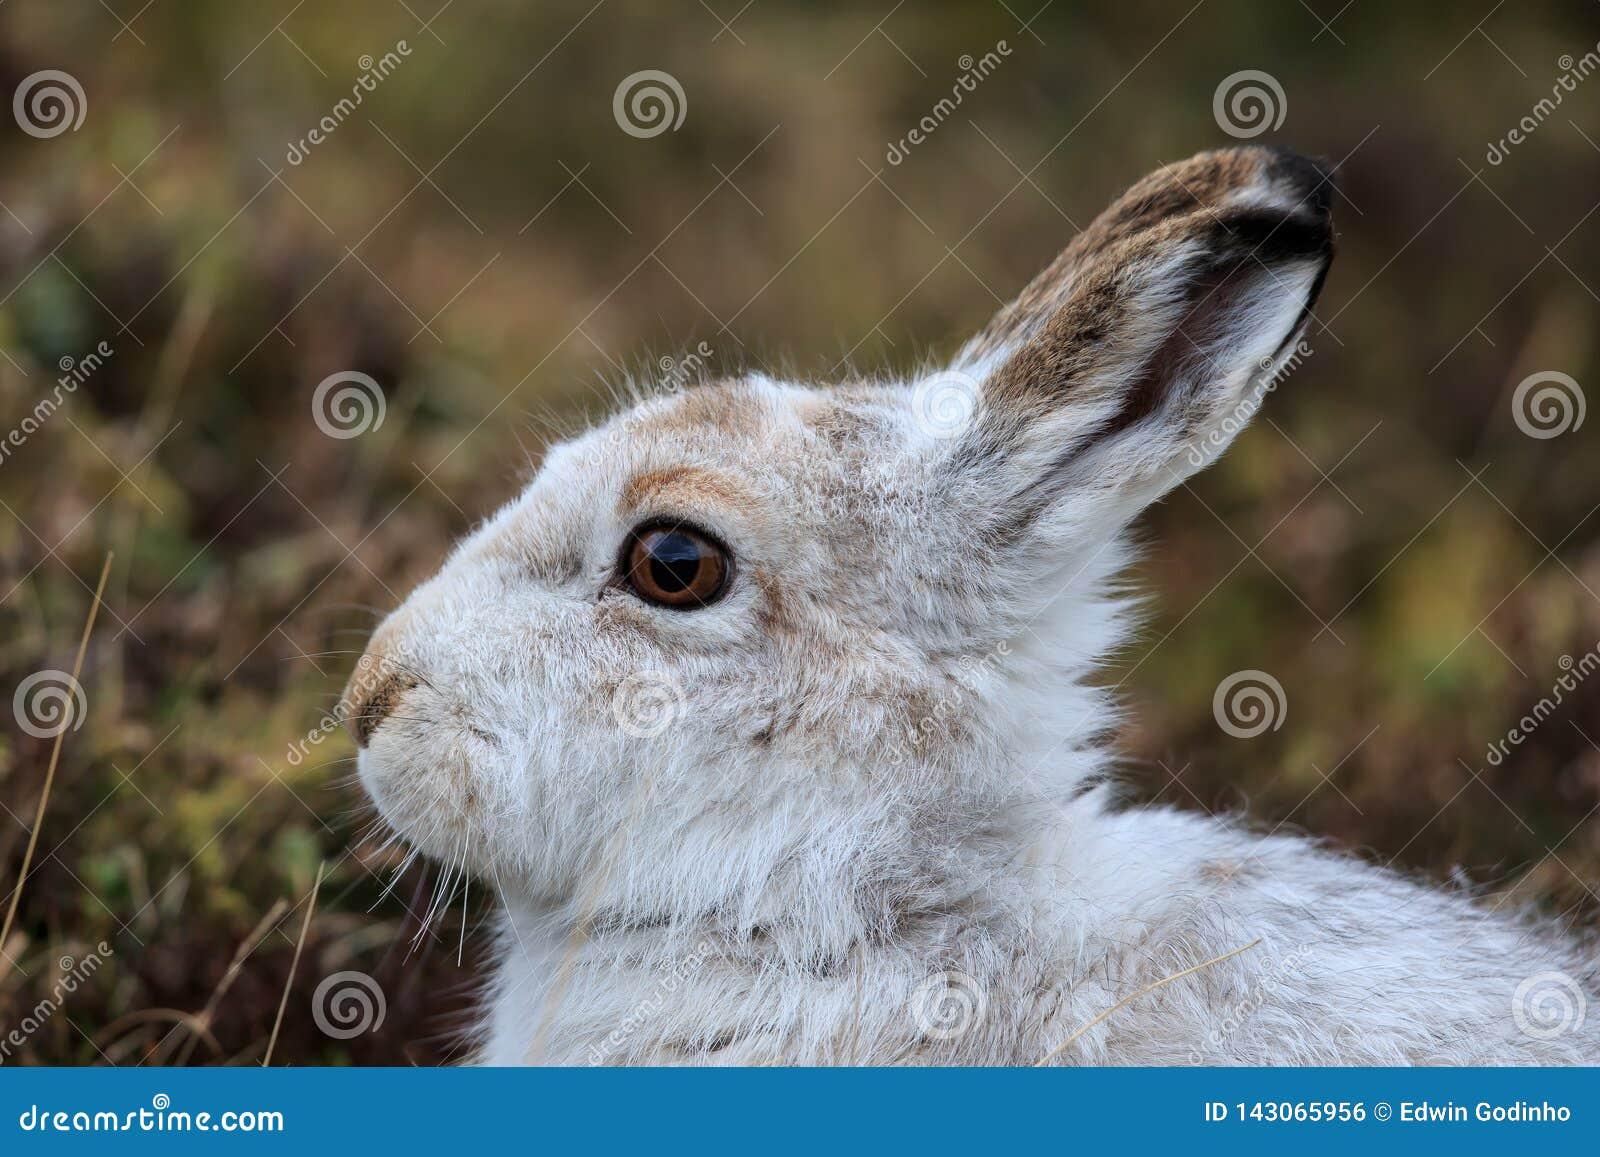 A Mountain hare outside its burrow up close